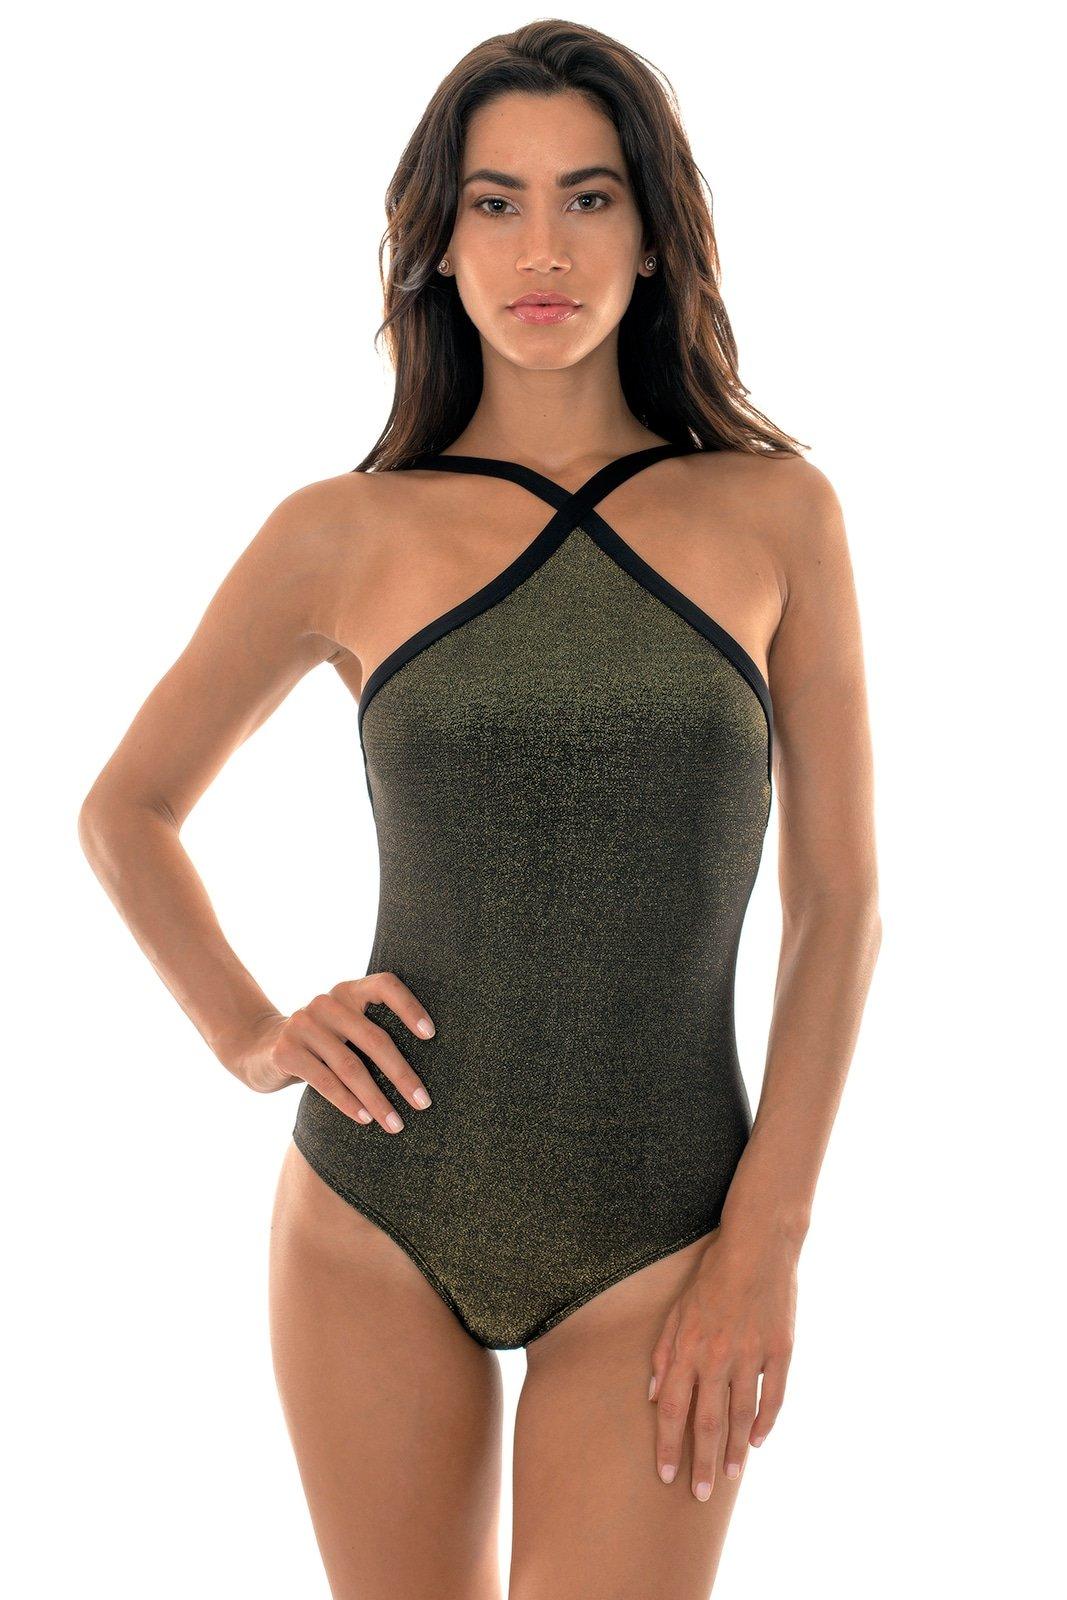 ac31cc8f24881 Shiny Black Lurex One-piece Swimsuit - High Neck Radiante - Rio de Sol